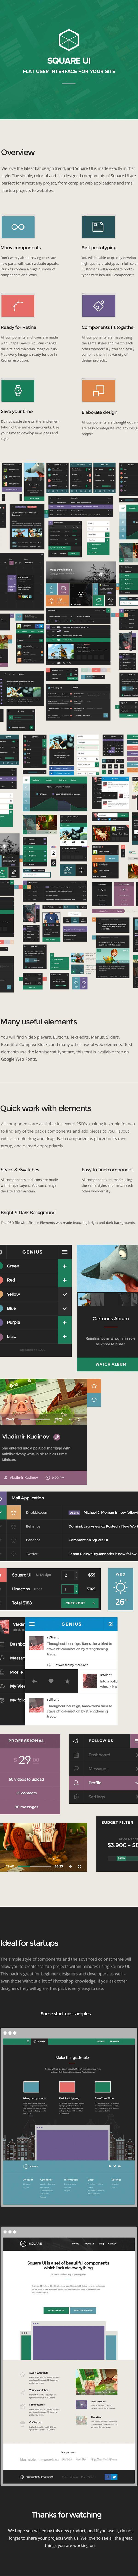 Square UI - Awesome Flat User Interface Pack by Vladimir Kudinov, via Behance